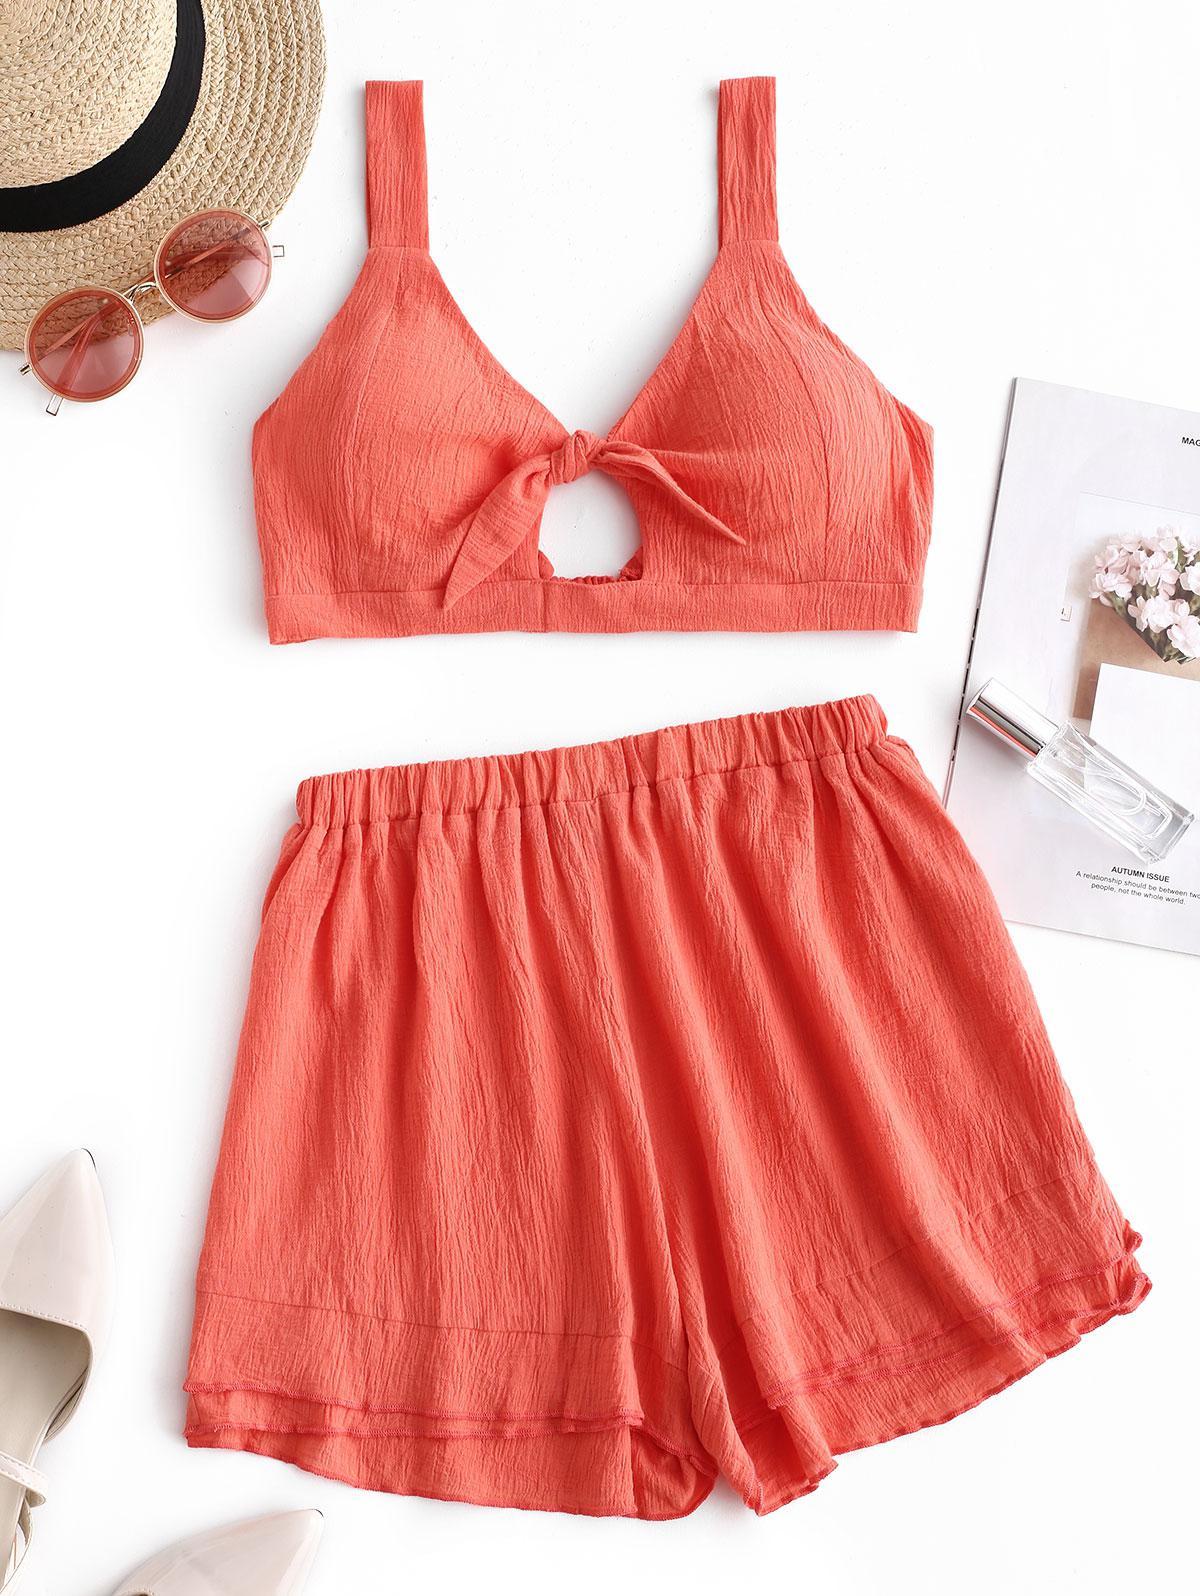 Cut Out Crop Top and Shorts Set, Pumpkin orange